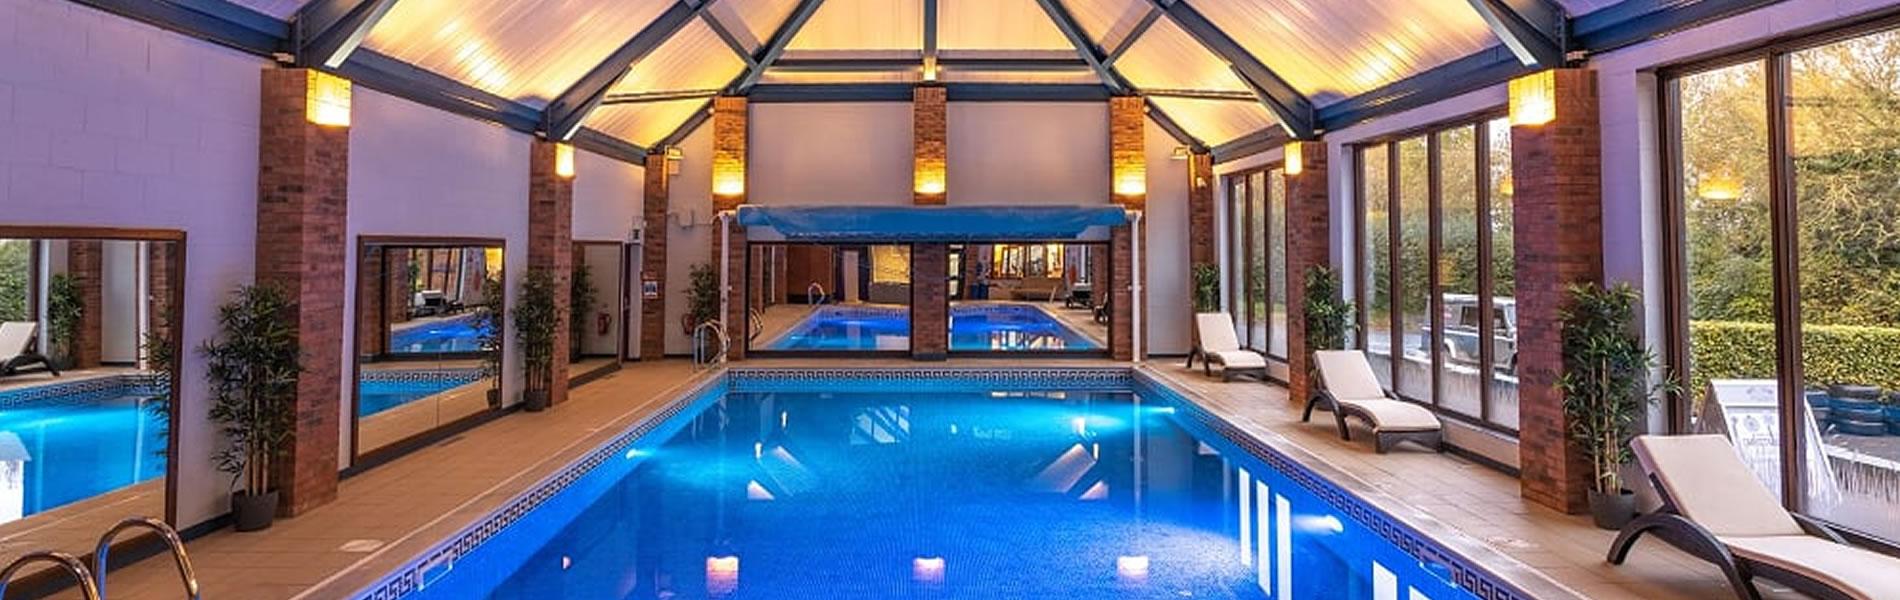 Breedon Priory Health Club - Swim